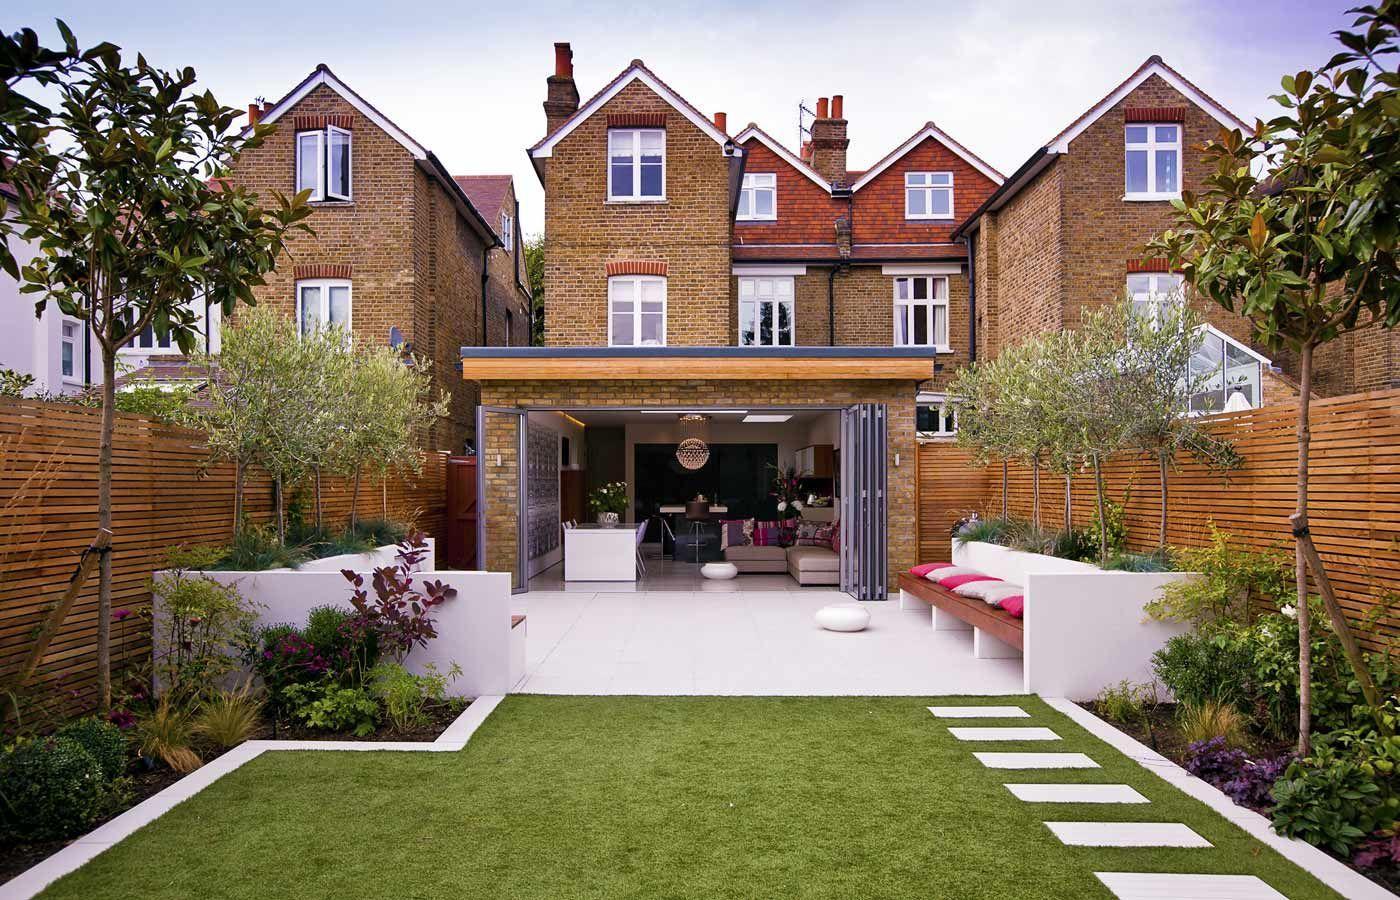 Image result for terraced house back garden ideas | Modern ... on Tiny Back Garden Ideas id=31019